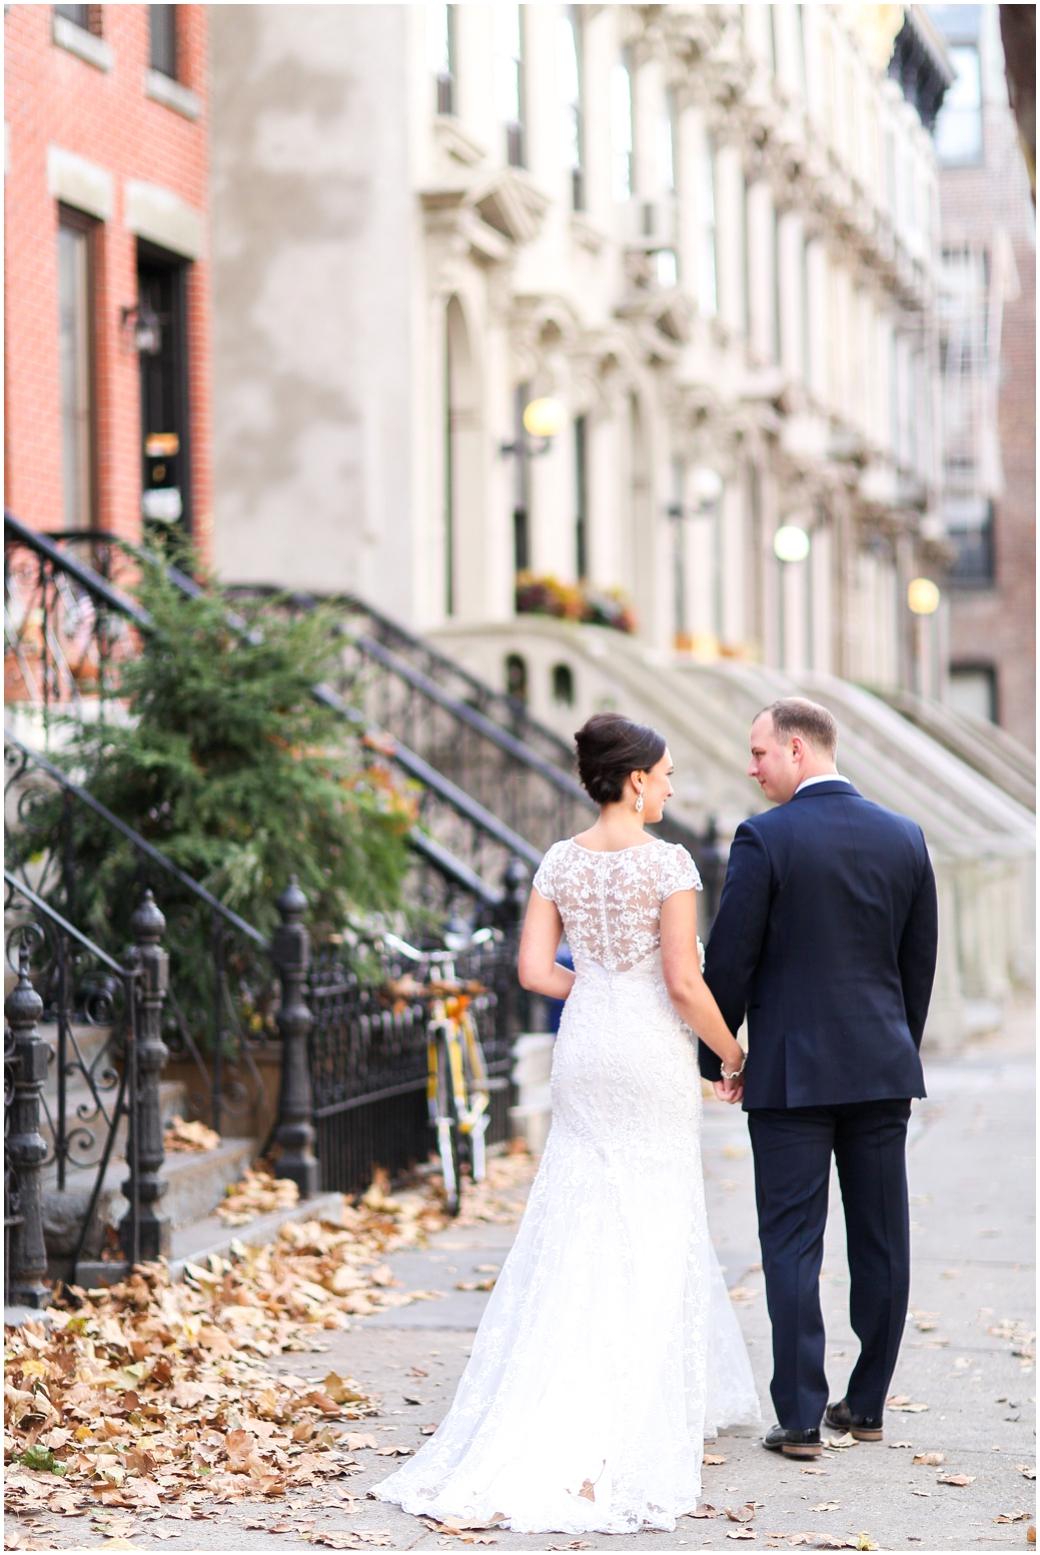 Nyc Long Island City Wedding Photographer Astoria Queens Manhattan